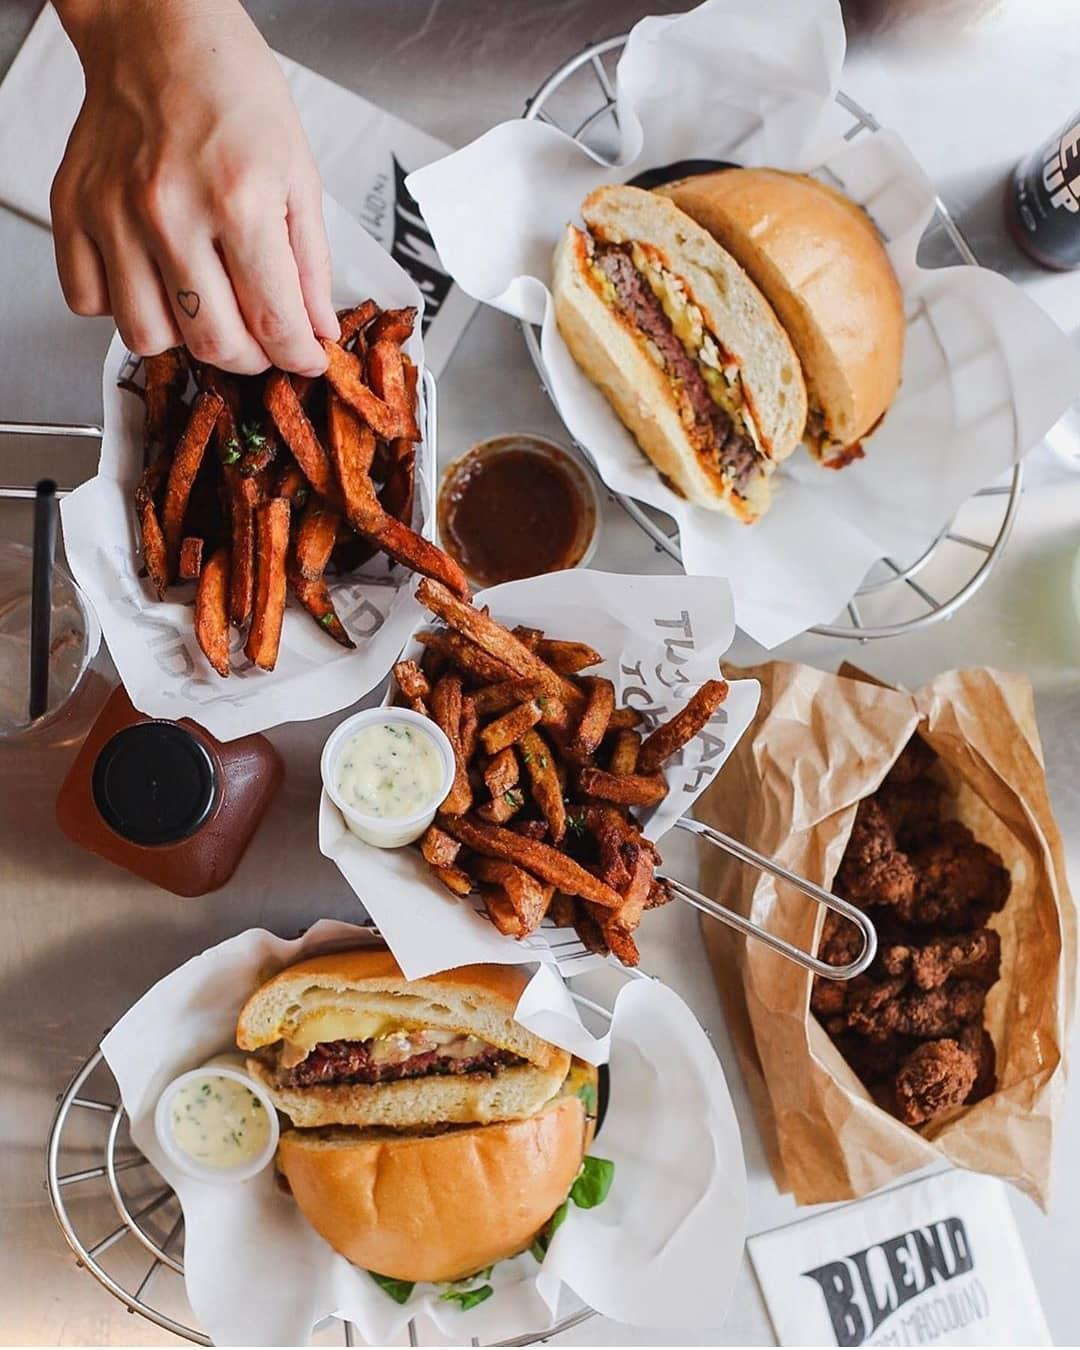 meilleur burger de paris blend paris restaurant burger paris blend madeleine blend charonne beaumarchais odeon blend burger livraison blend brunch